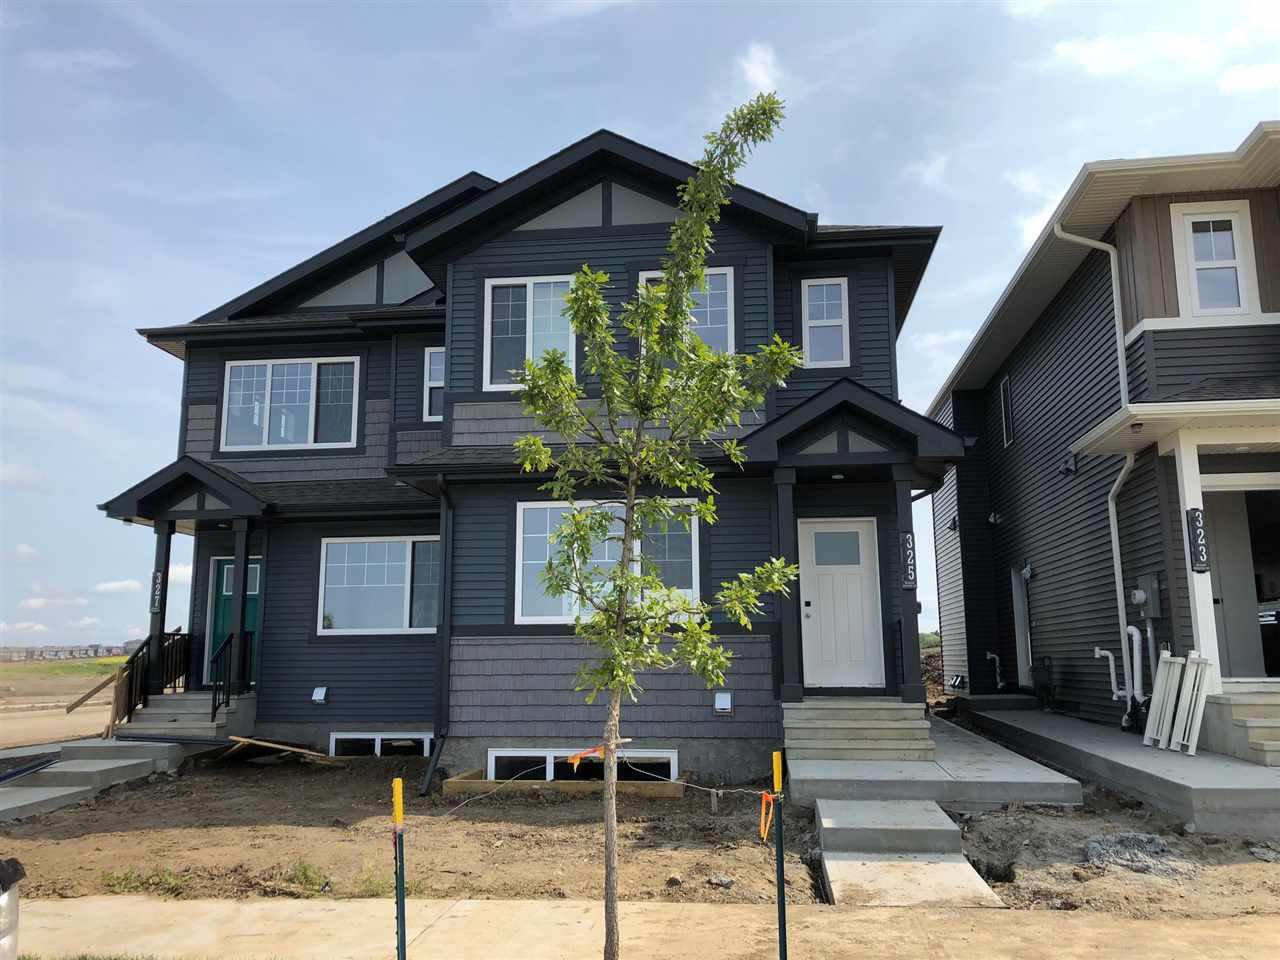 Main Photo: 303 Orchards Boulevard in Edmonton: Zone 53 House Half Duplex for sale : MLS®# E4172082